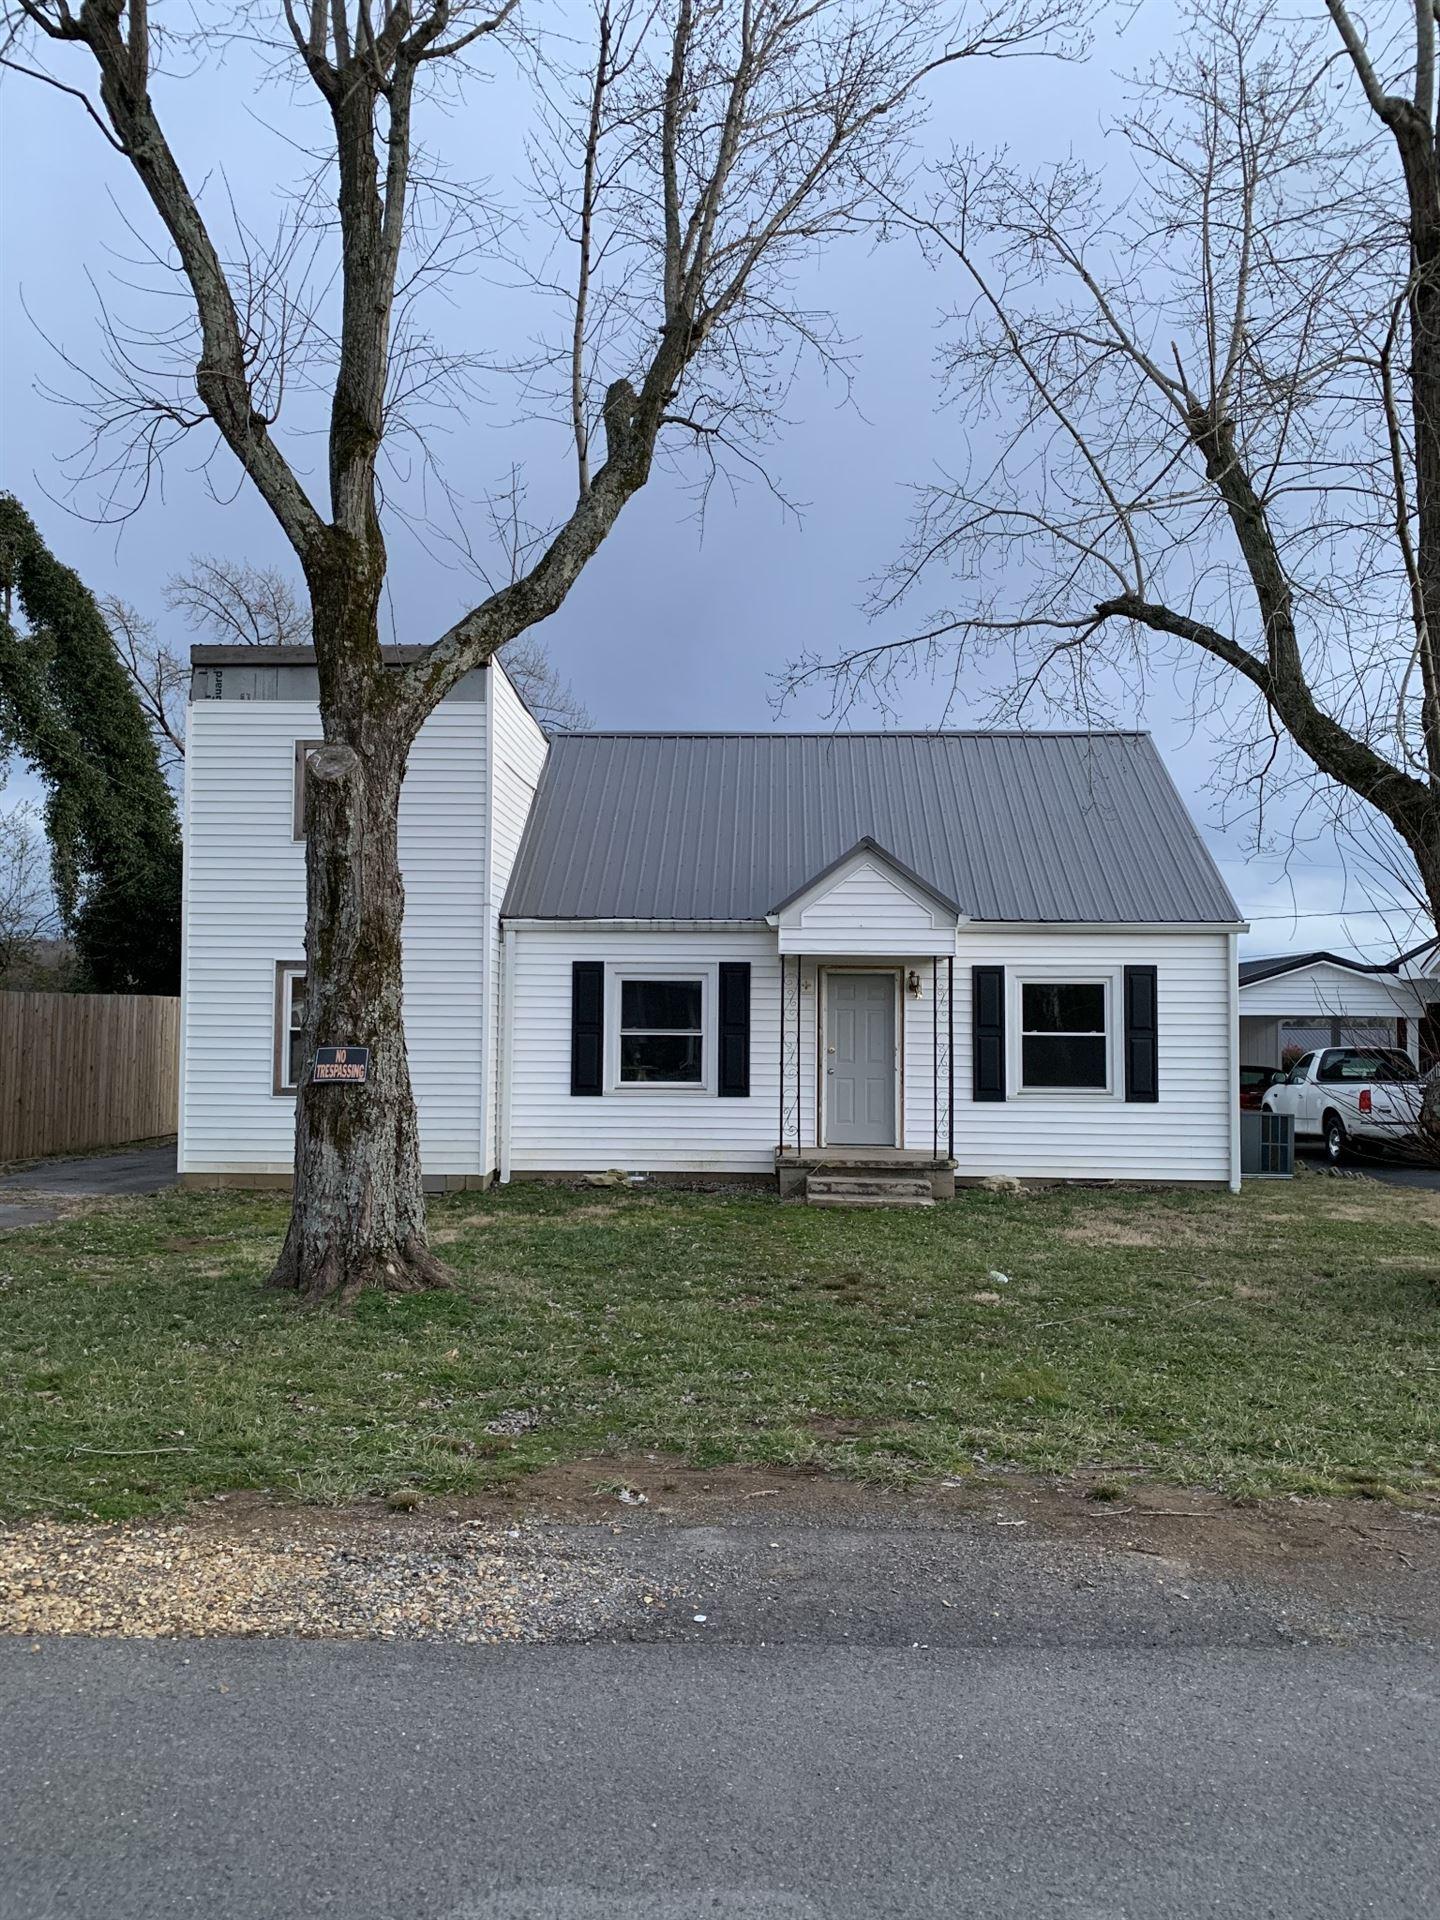 401 W Colonial St, Woodbury, TN 37190 - MLS#: 2227097